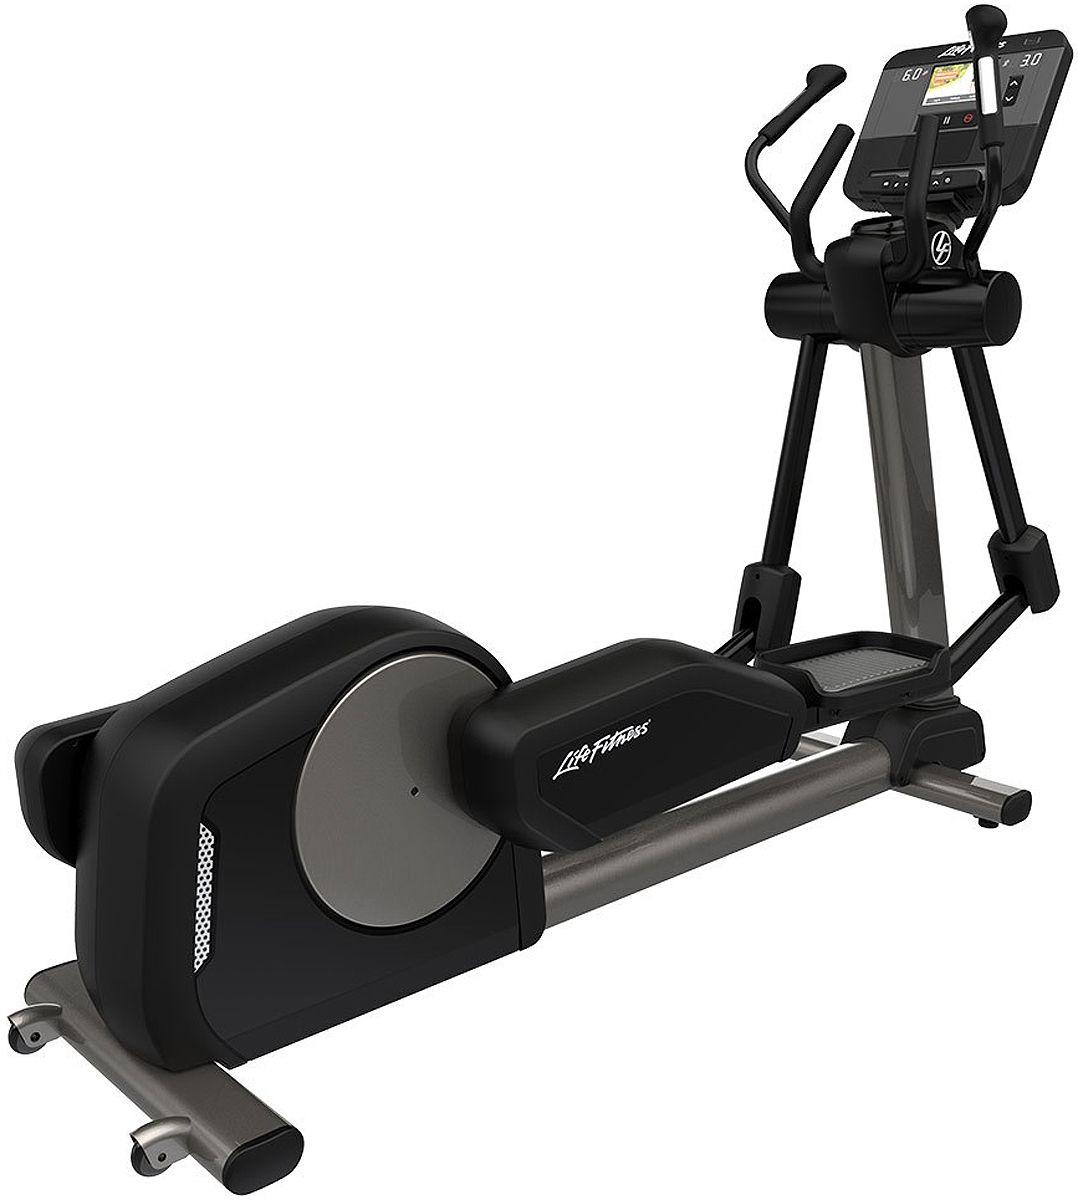 Life Fitness Activate Treadmill Manual: Life Fitness Elliptical Cross-Trainer